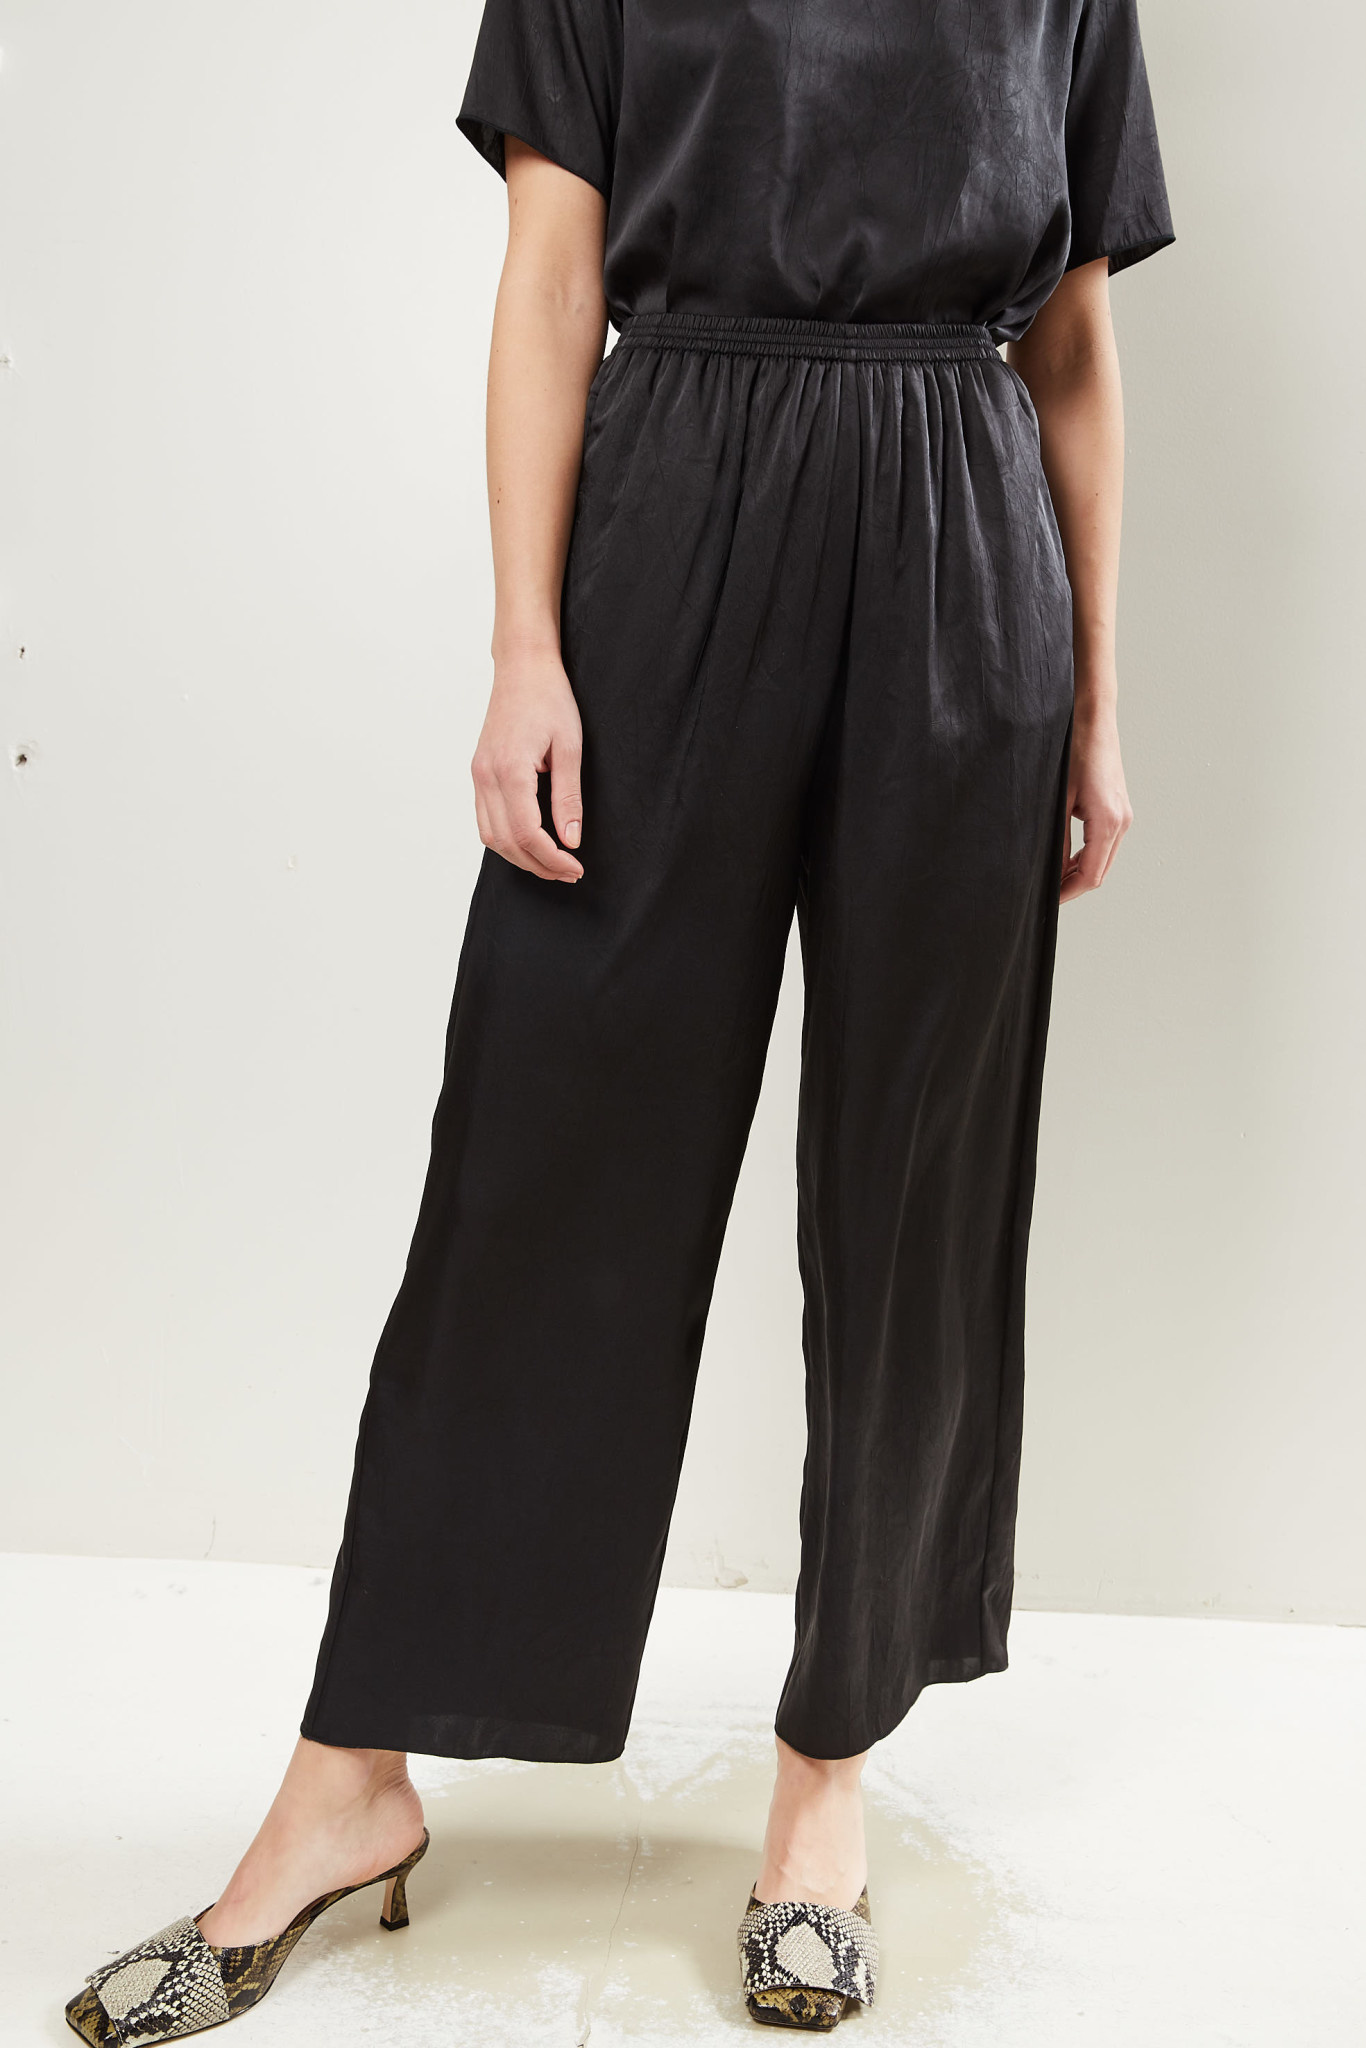 Forte Forte - Crash satin elasticated pants nero 8000